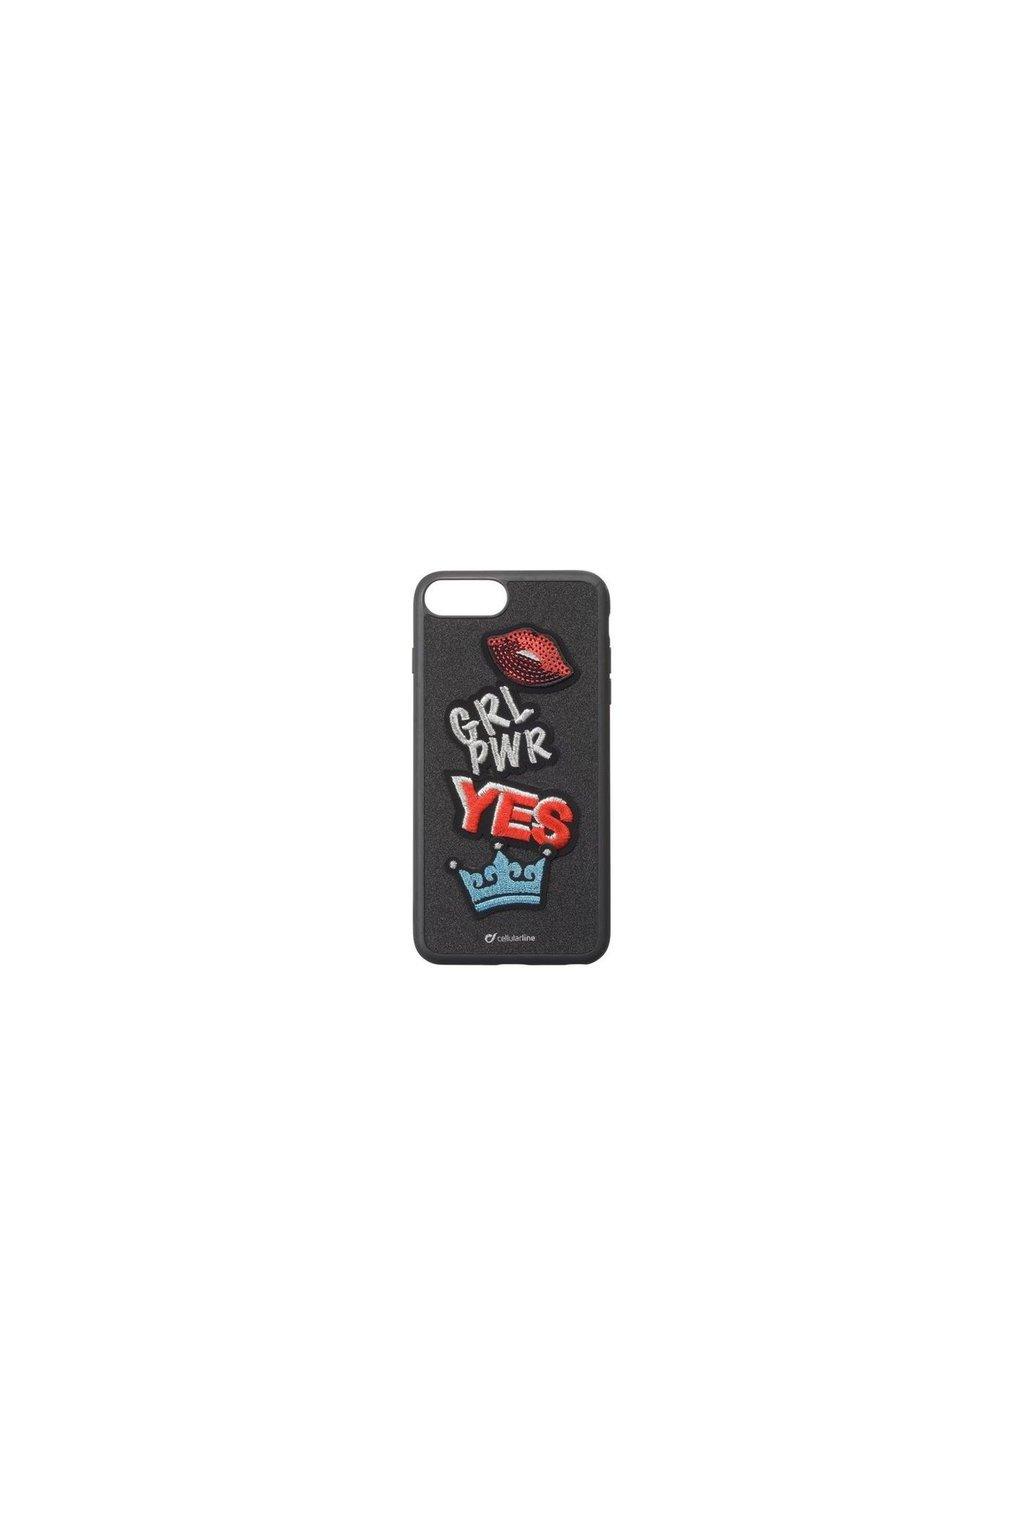 2033 cellularline patch amour kryt iphone 6 7 8 plus